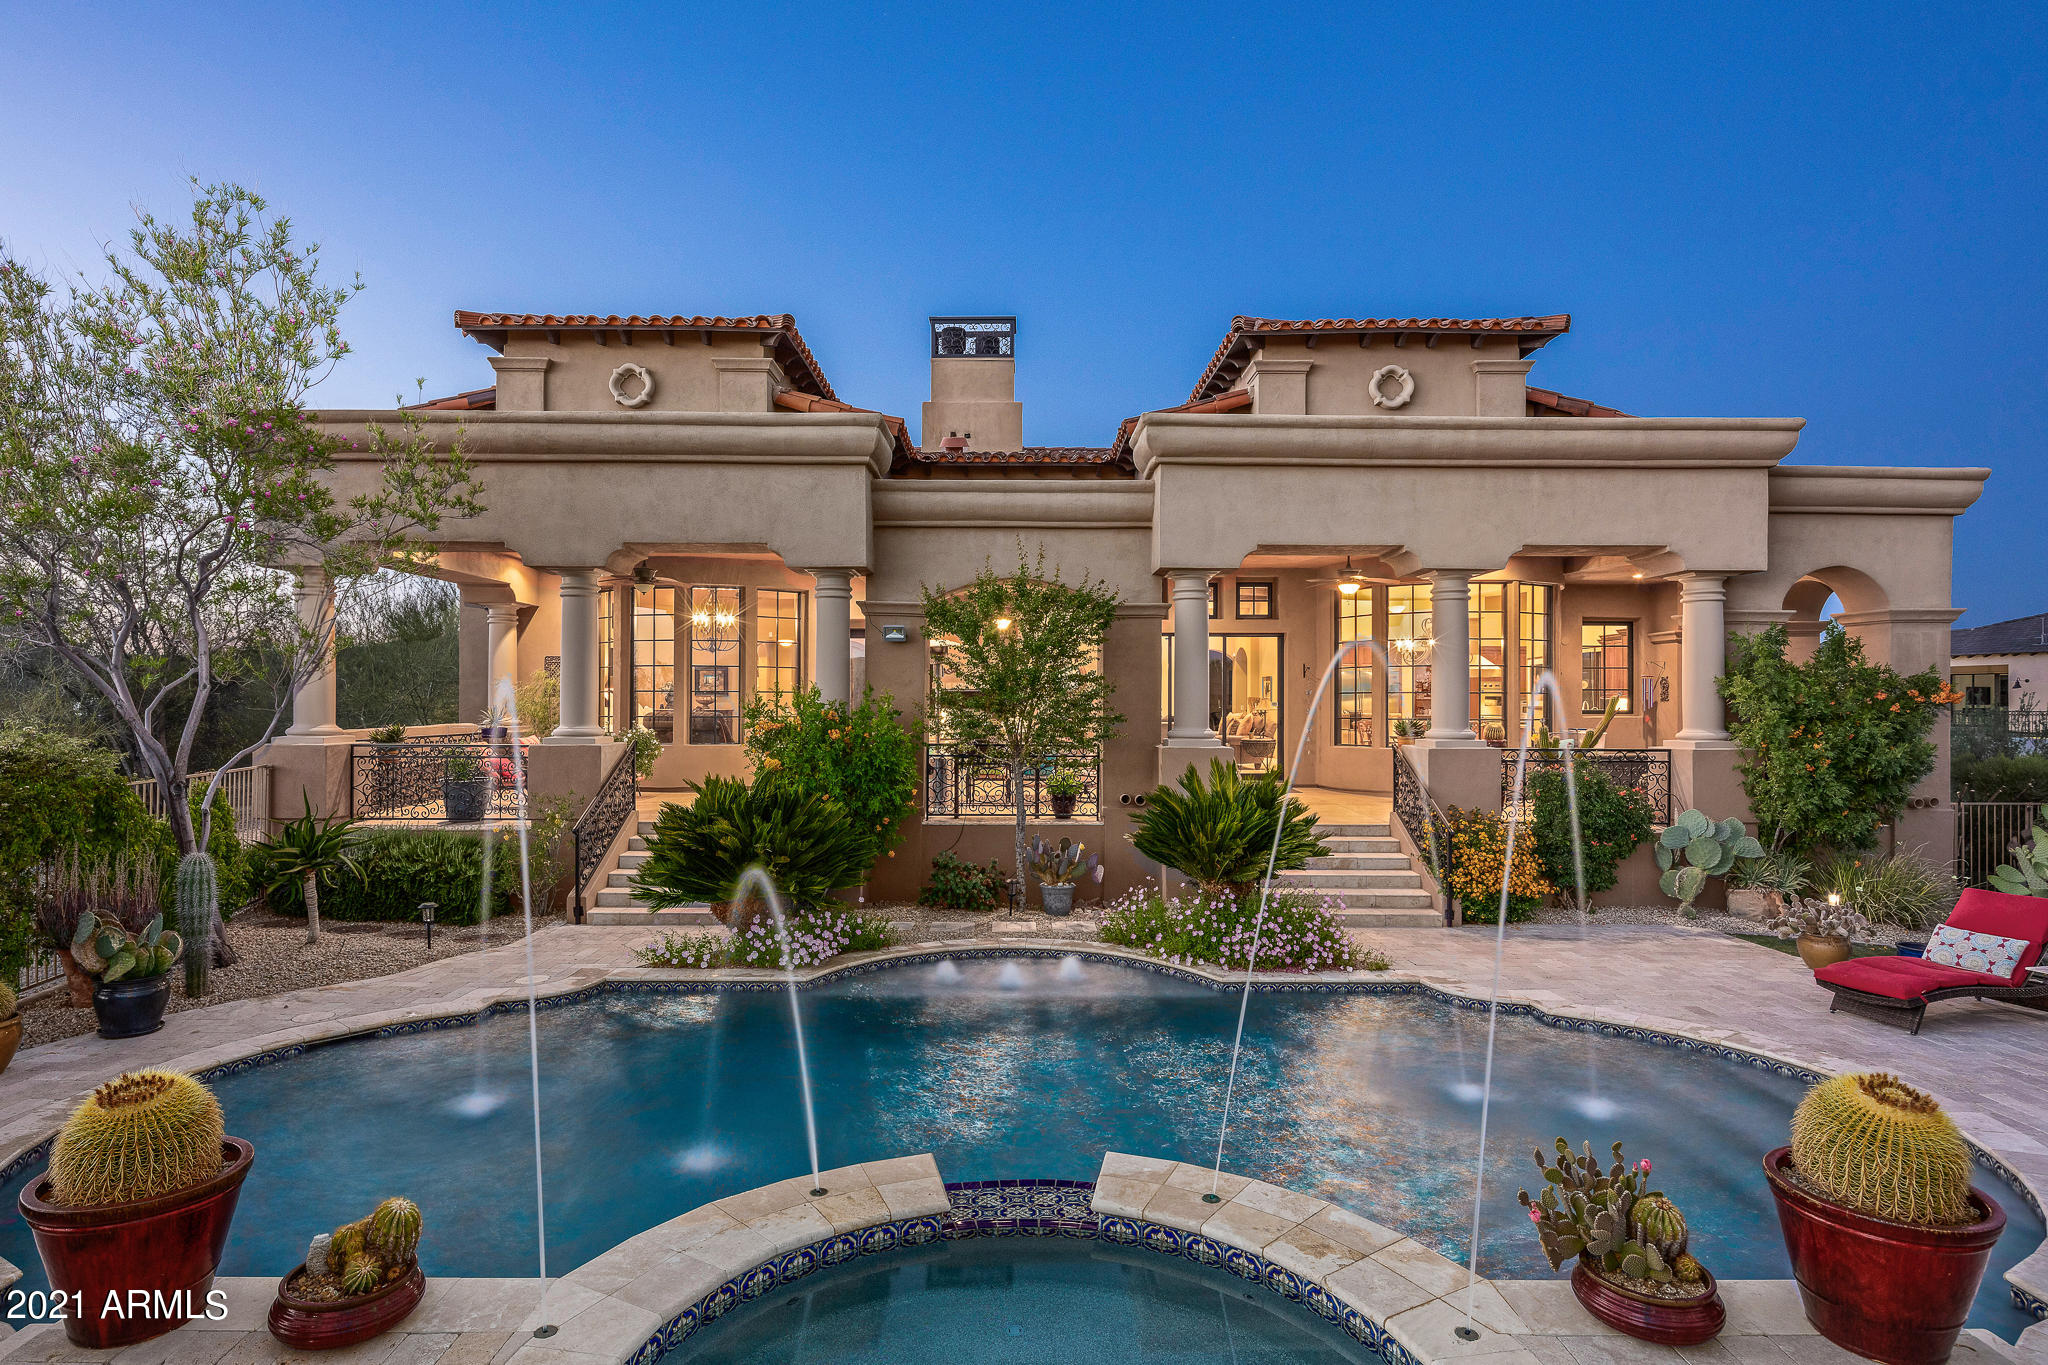 8491 NIGHTINGALE STAR Drive, Scottsdale, Arizona 85266, 4 Bedrooms Bedrooms, ,4.5 BathroomsBathrooms,Residential,For Sale,NIGHTINGALE STAR,6232571